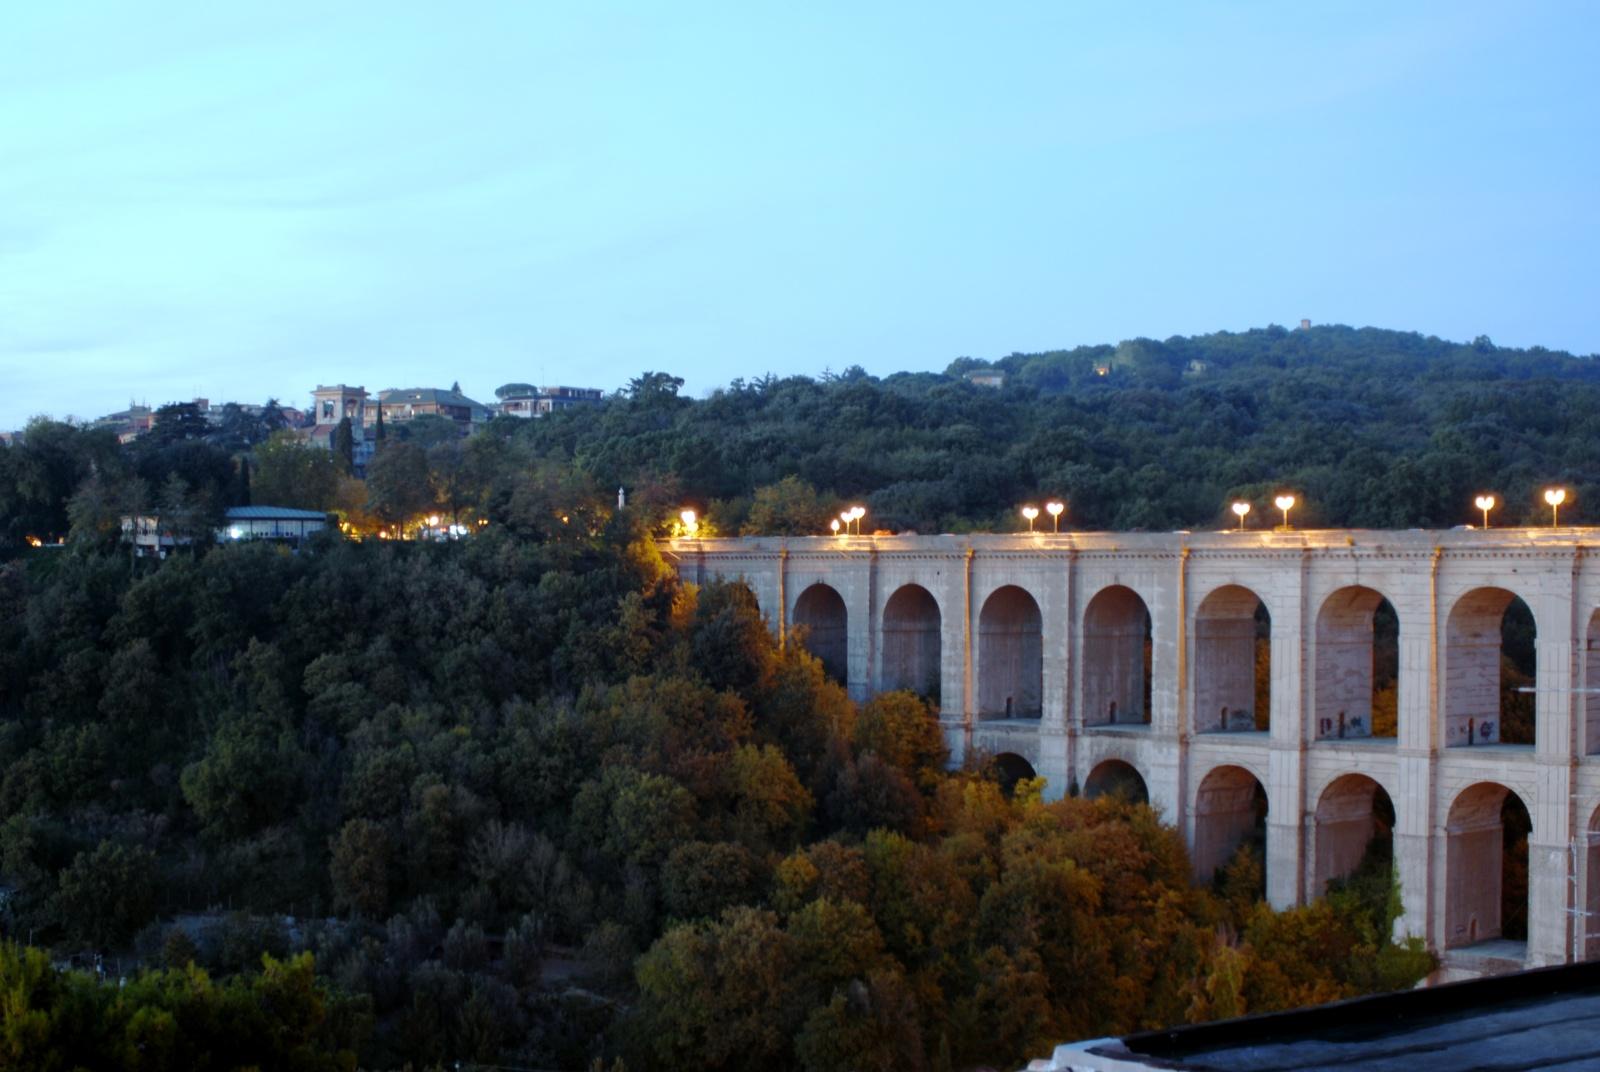 The city of Ariccia